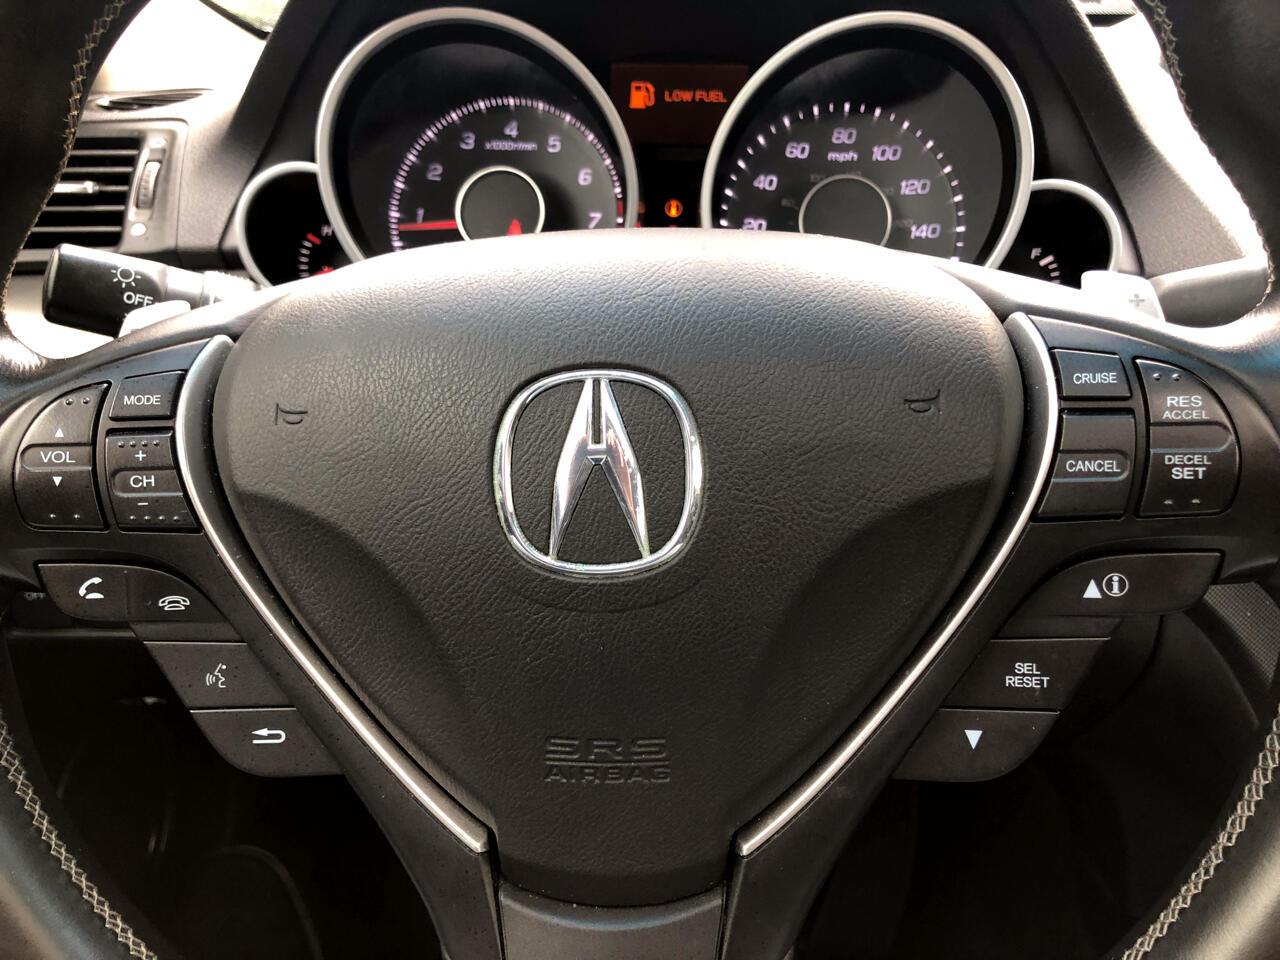 2012 Acura TL 4dr Sdn Auto SH-AWD Advance